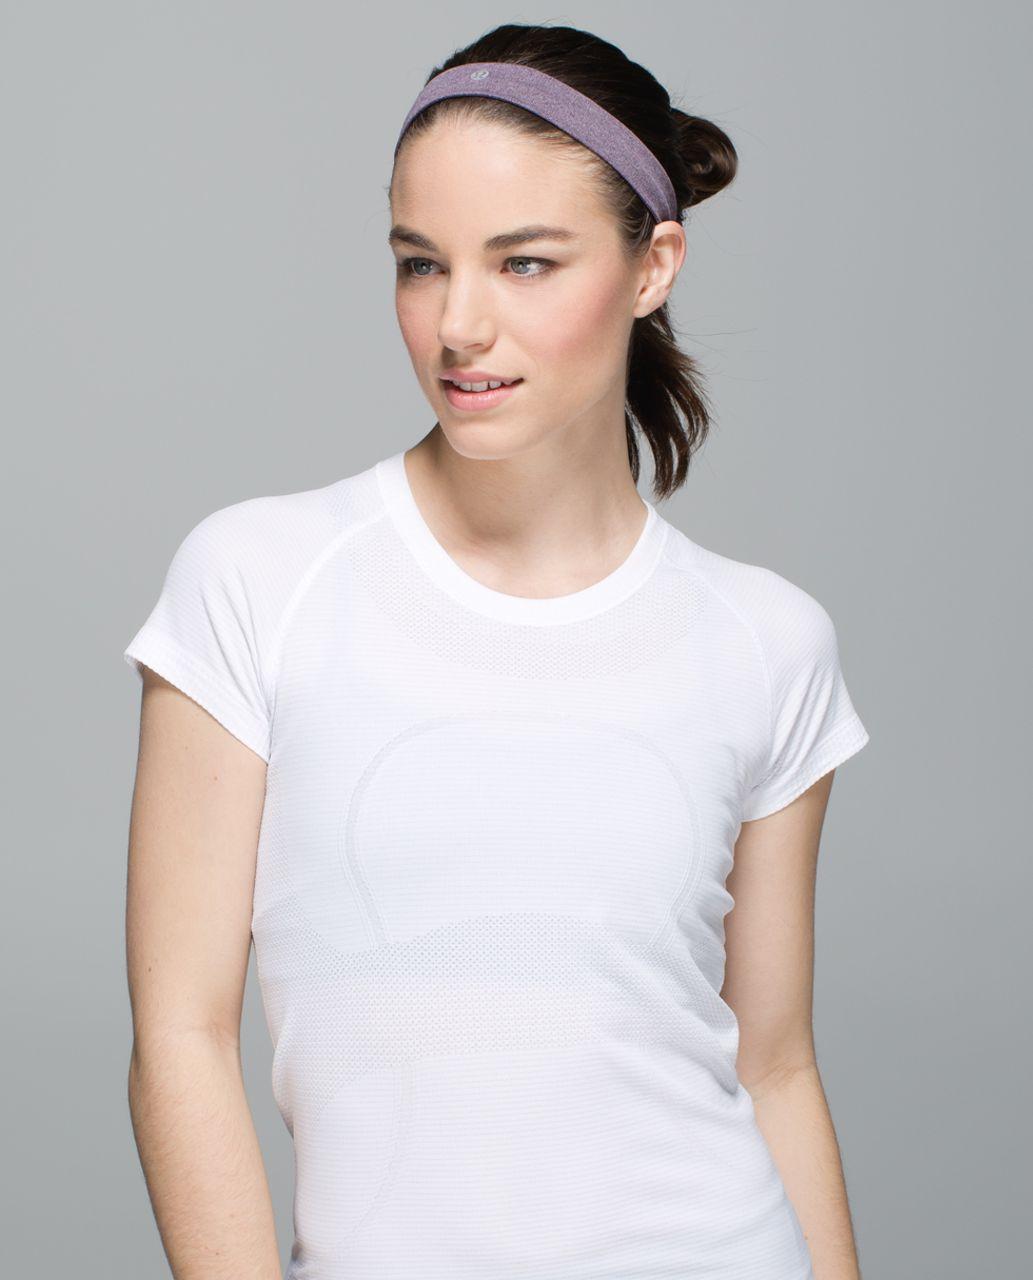 Lululemon Cardio Cross Trainer Headband - Heathered Black Cherry